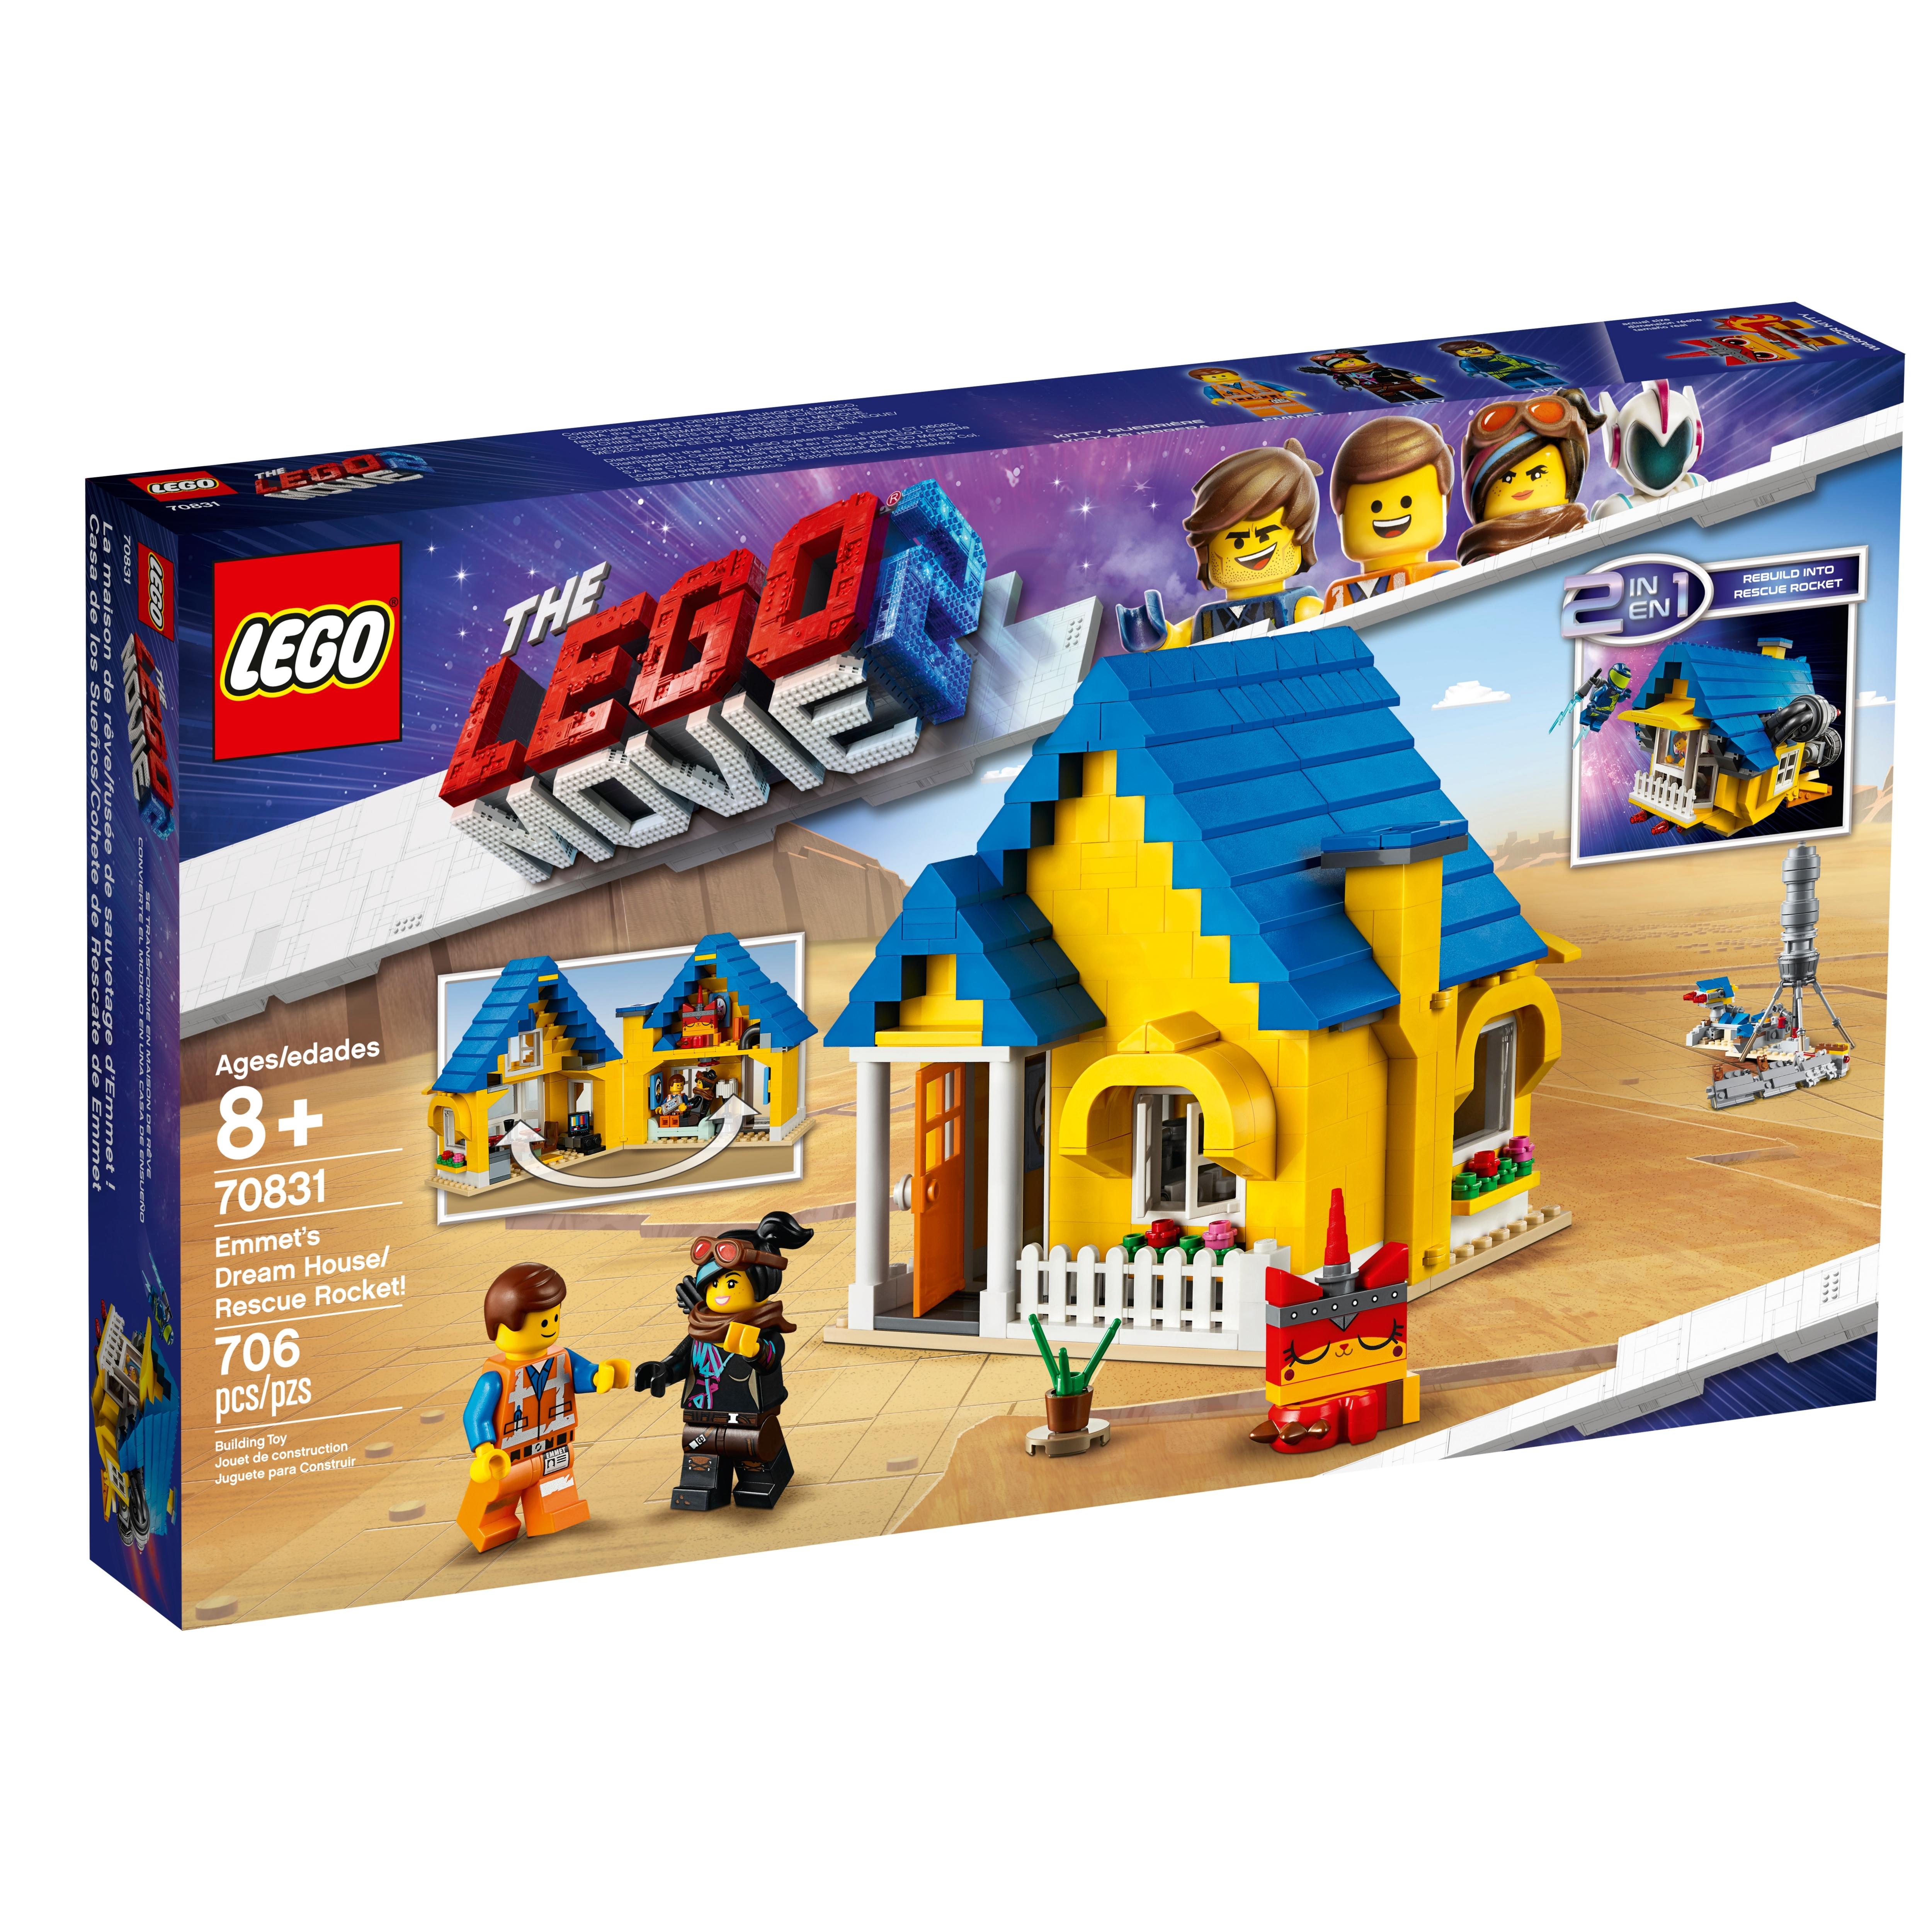 CITY LEGO WHITE PICKET FENCE TRAIN,HARRY POTTER 2